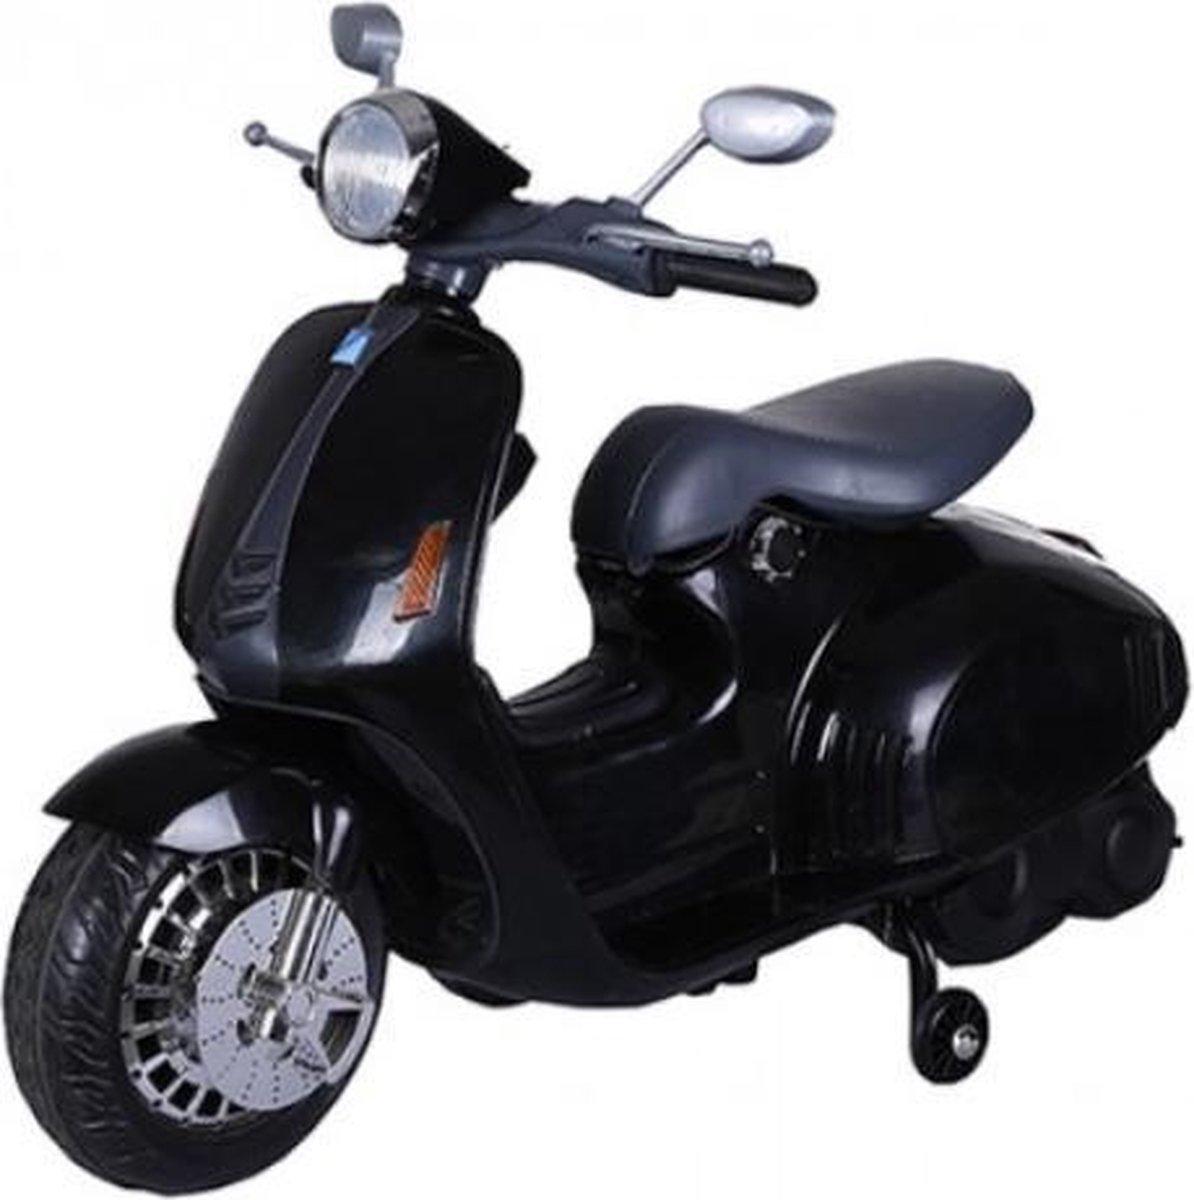 Retro scooter zwart 12V, Elektrische Kinderscooter